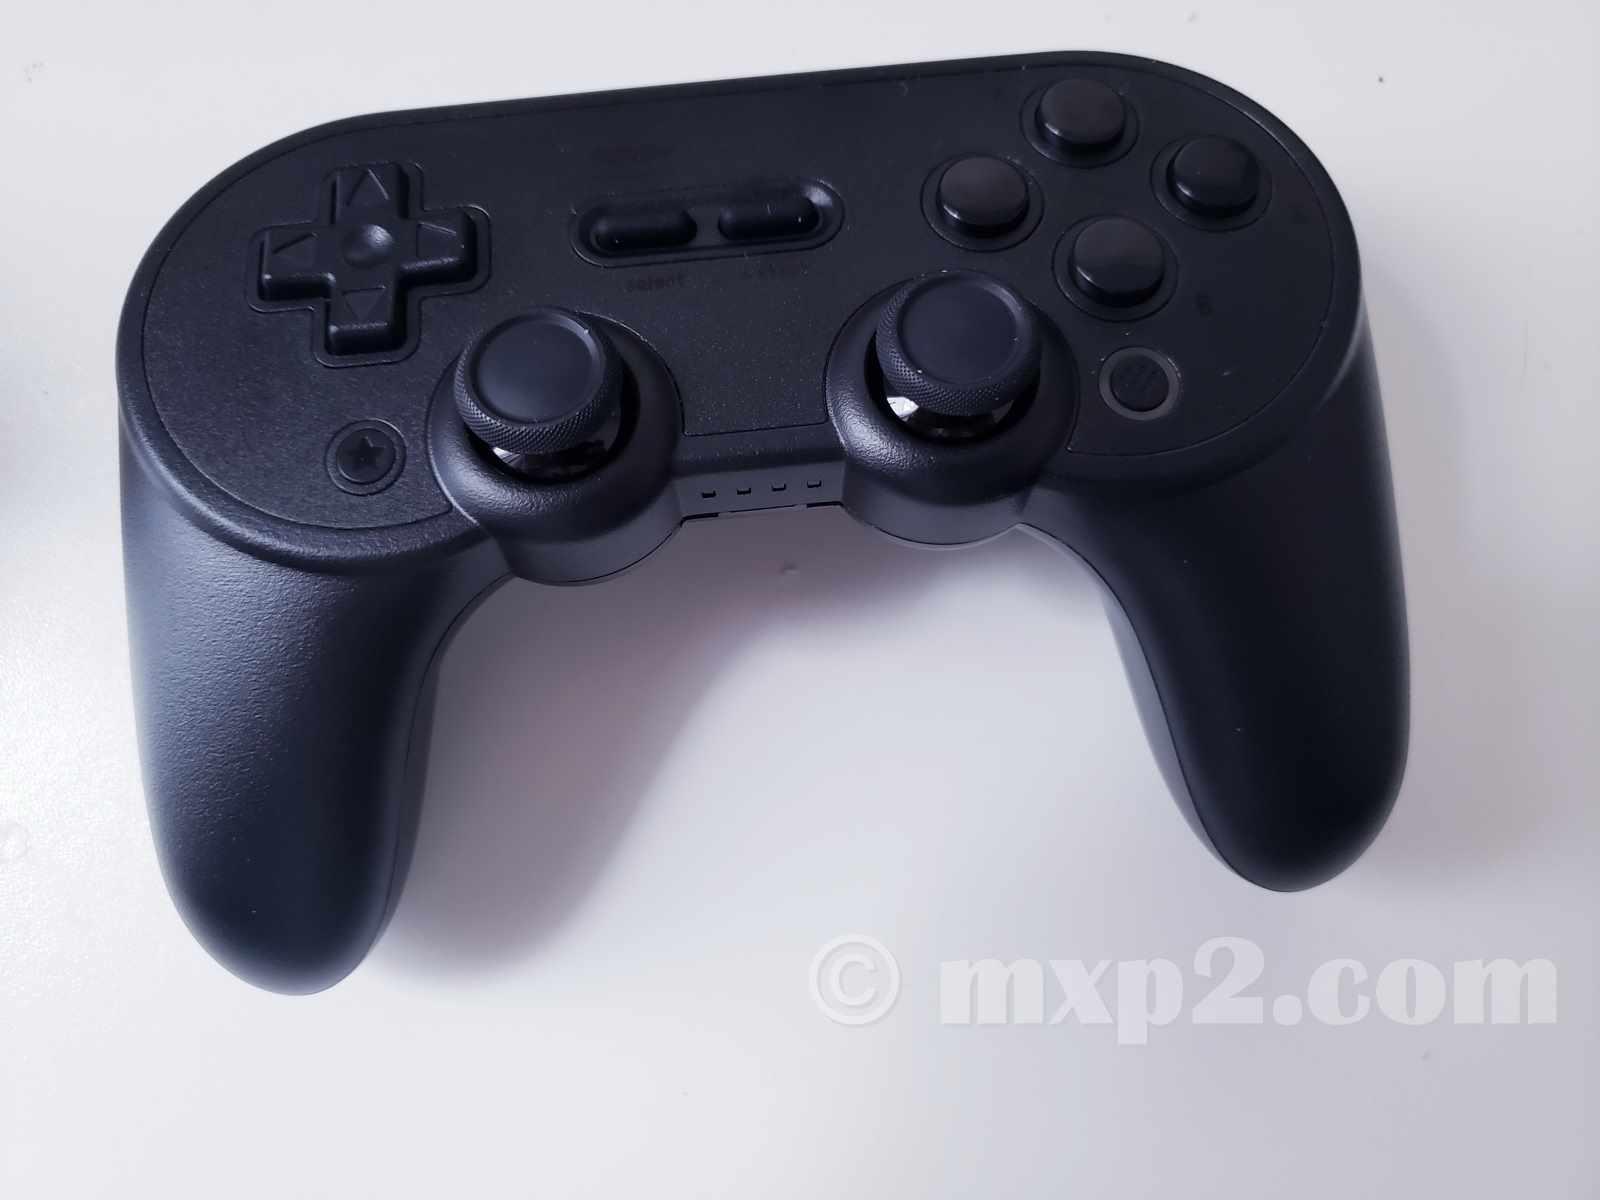 gamepad-8bitdo